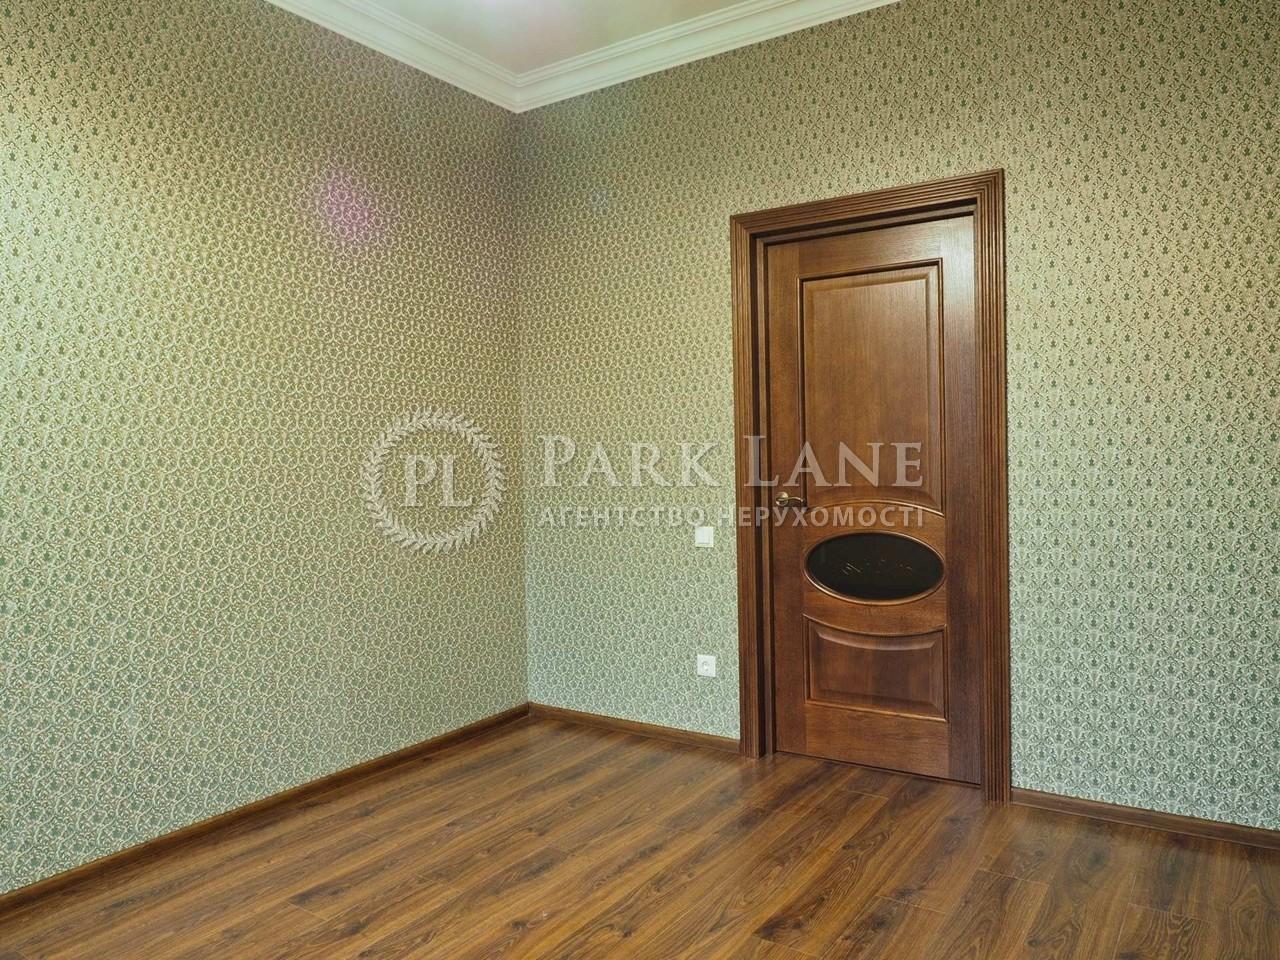 Квартира ул. Искровская, 3, Киев, M-38484 - Фото 6